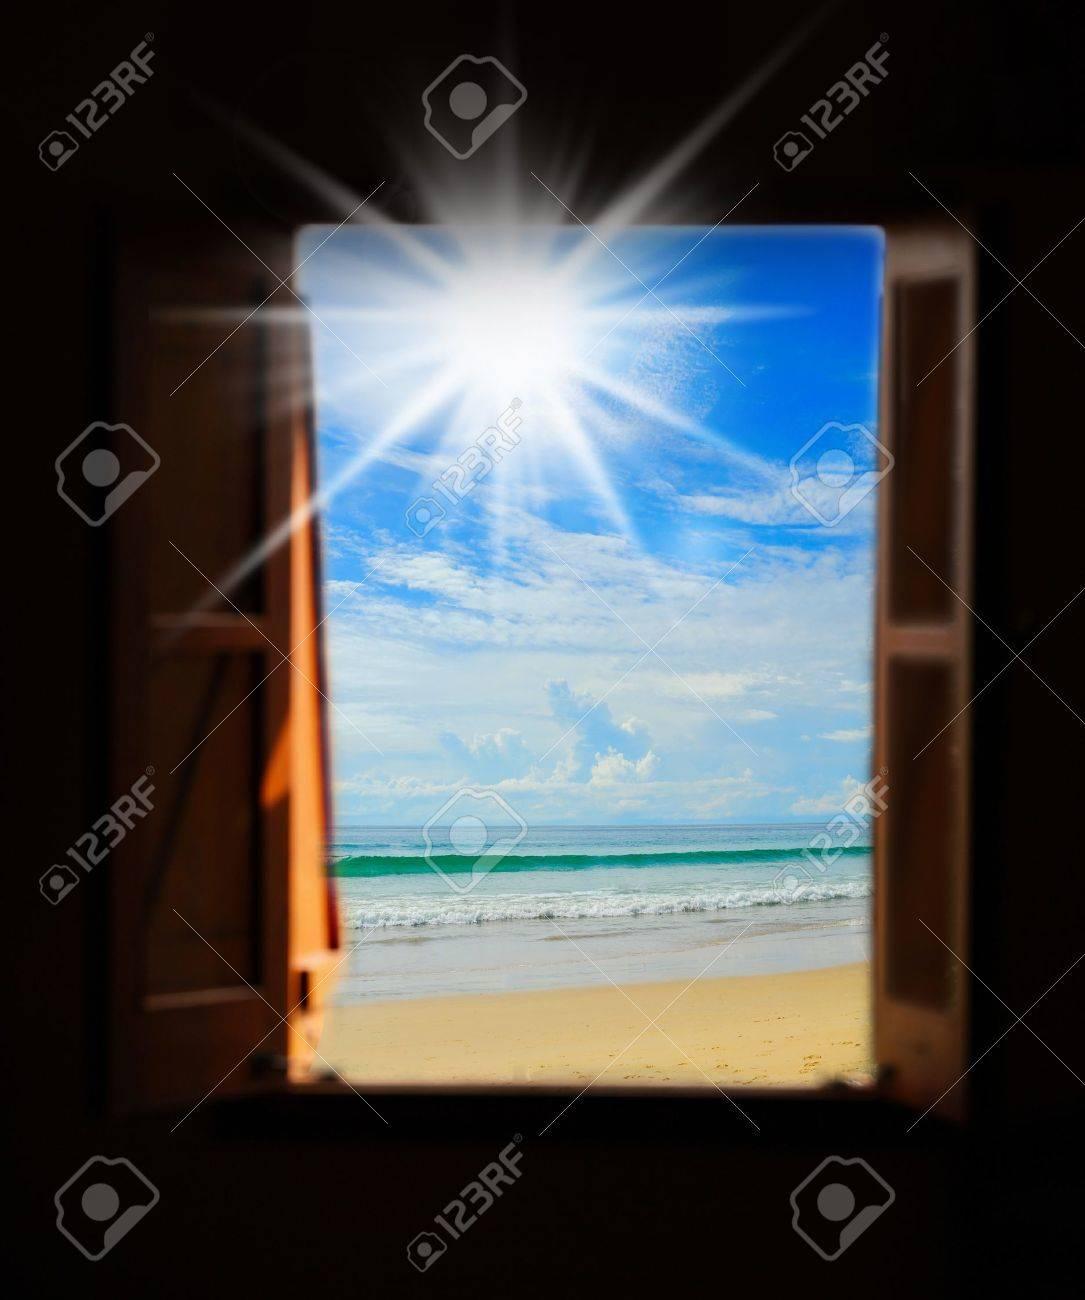 Sea view through an open window Stock Photo - 19926716